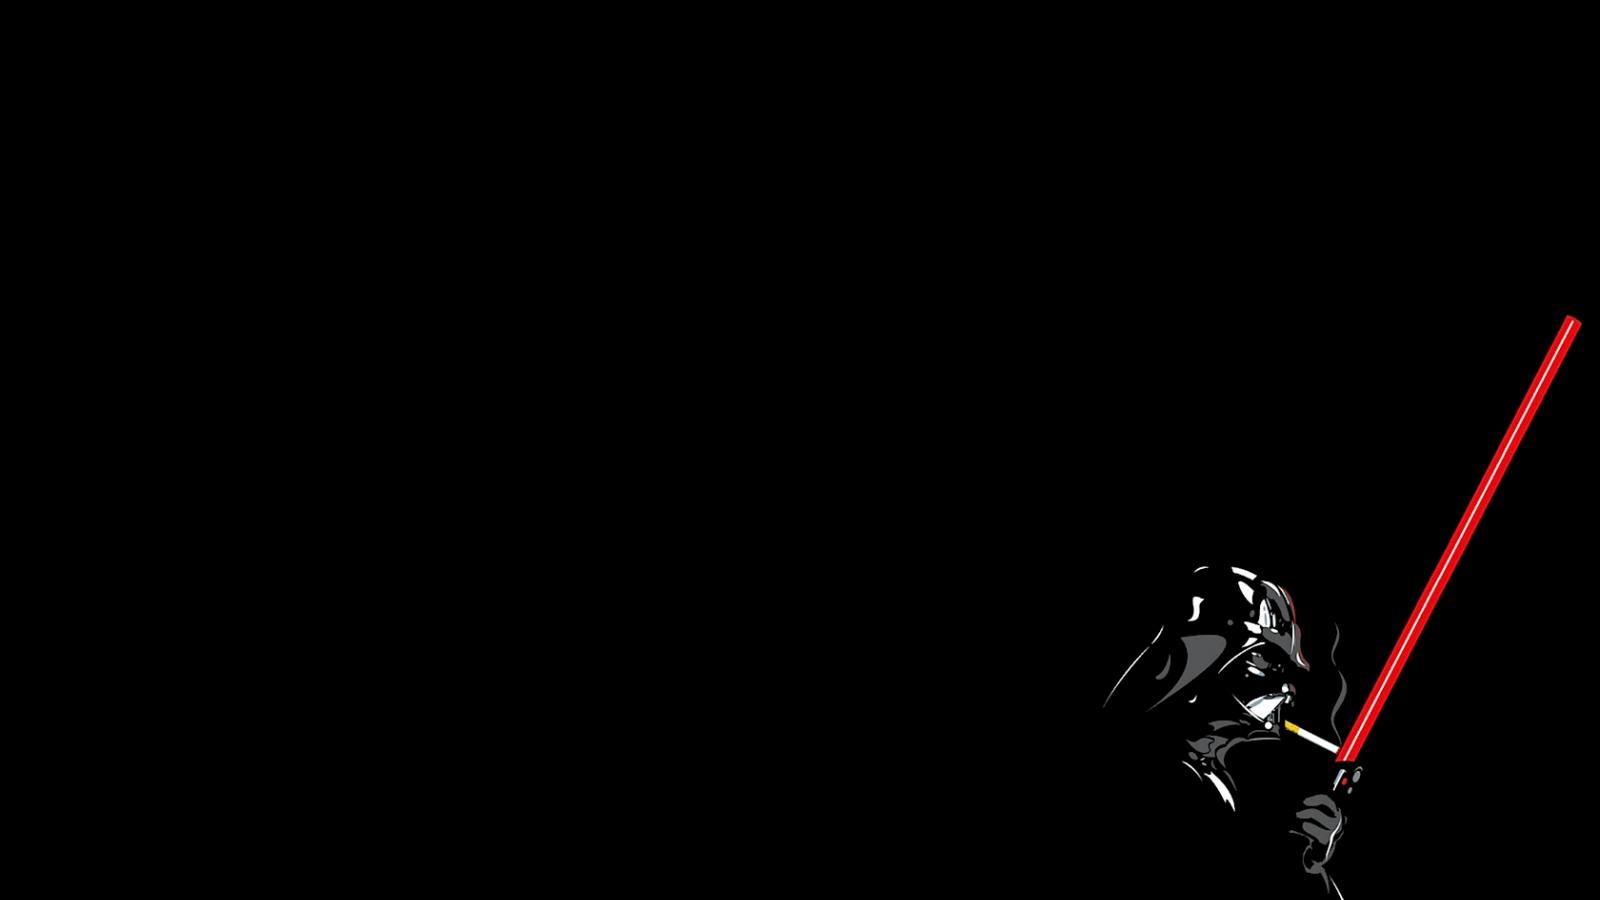 Free Download Wallpaper Hd 1080p Black And White Star Wars Super